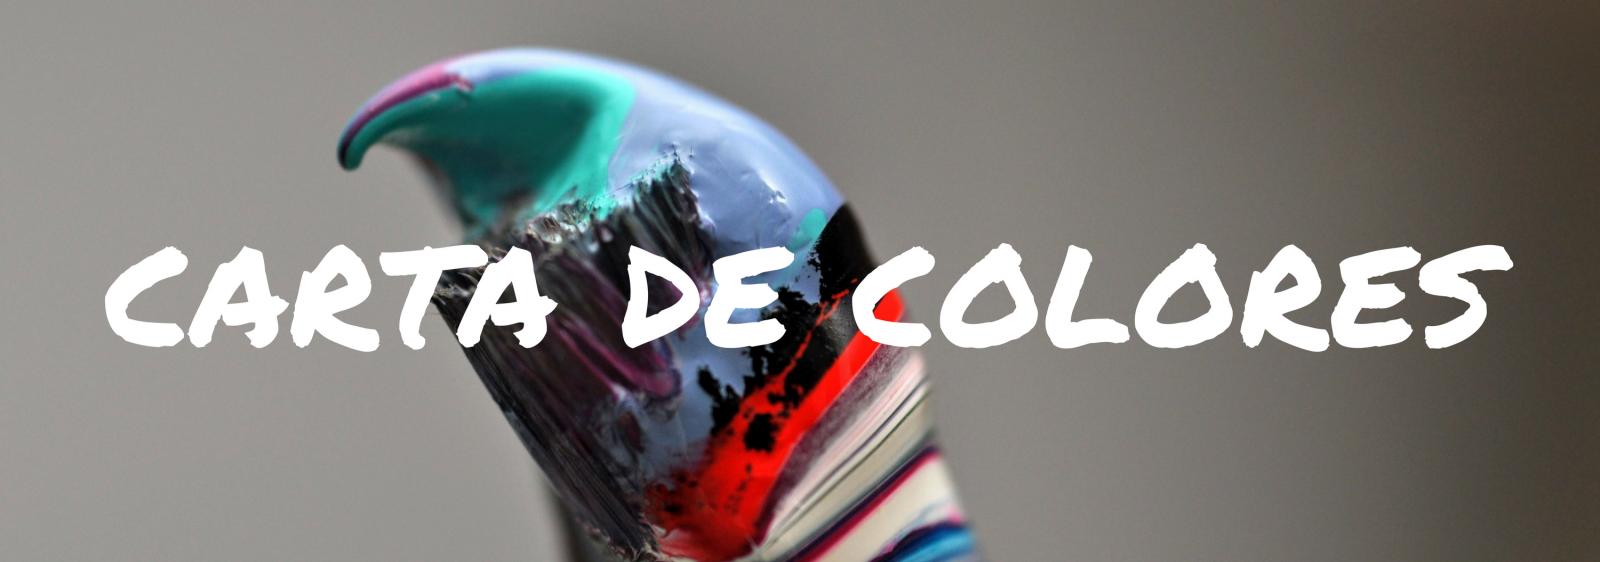 carta de colores pintura bicicletas zaragoza